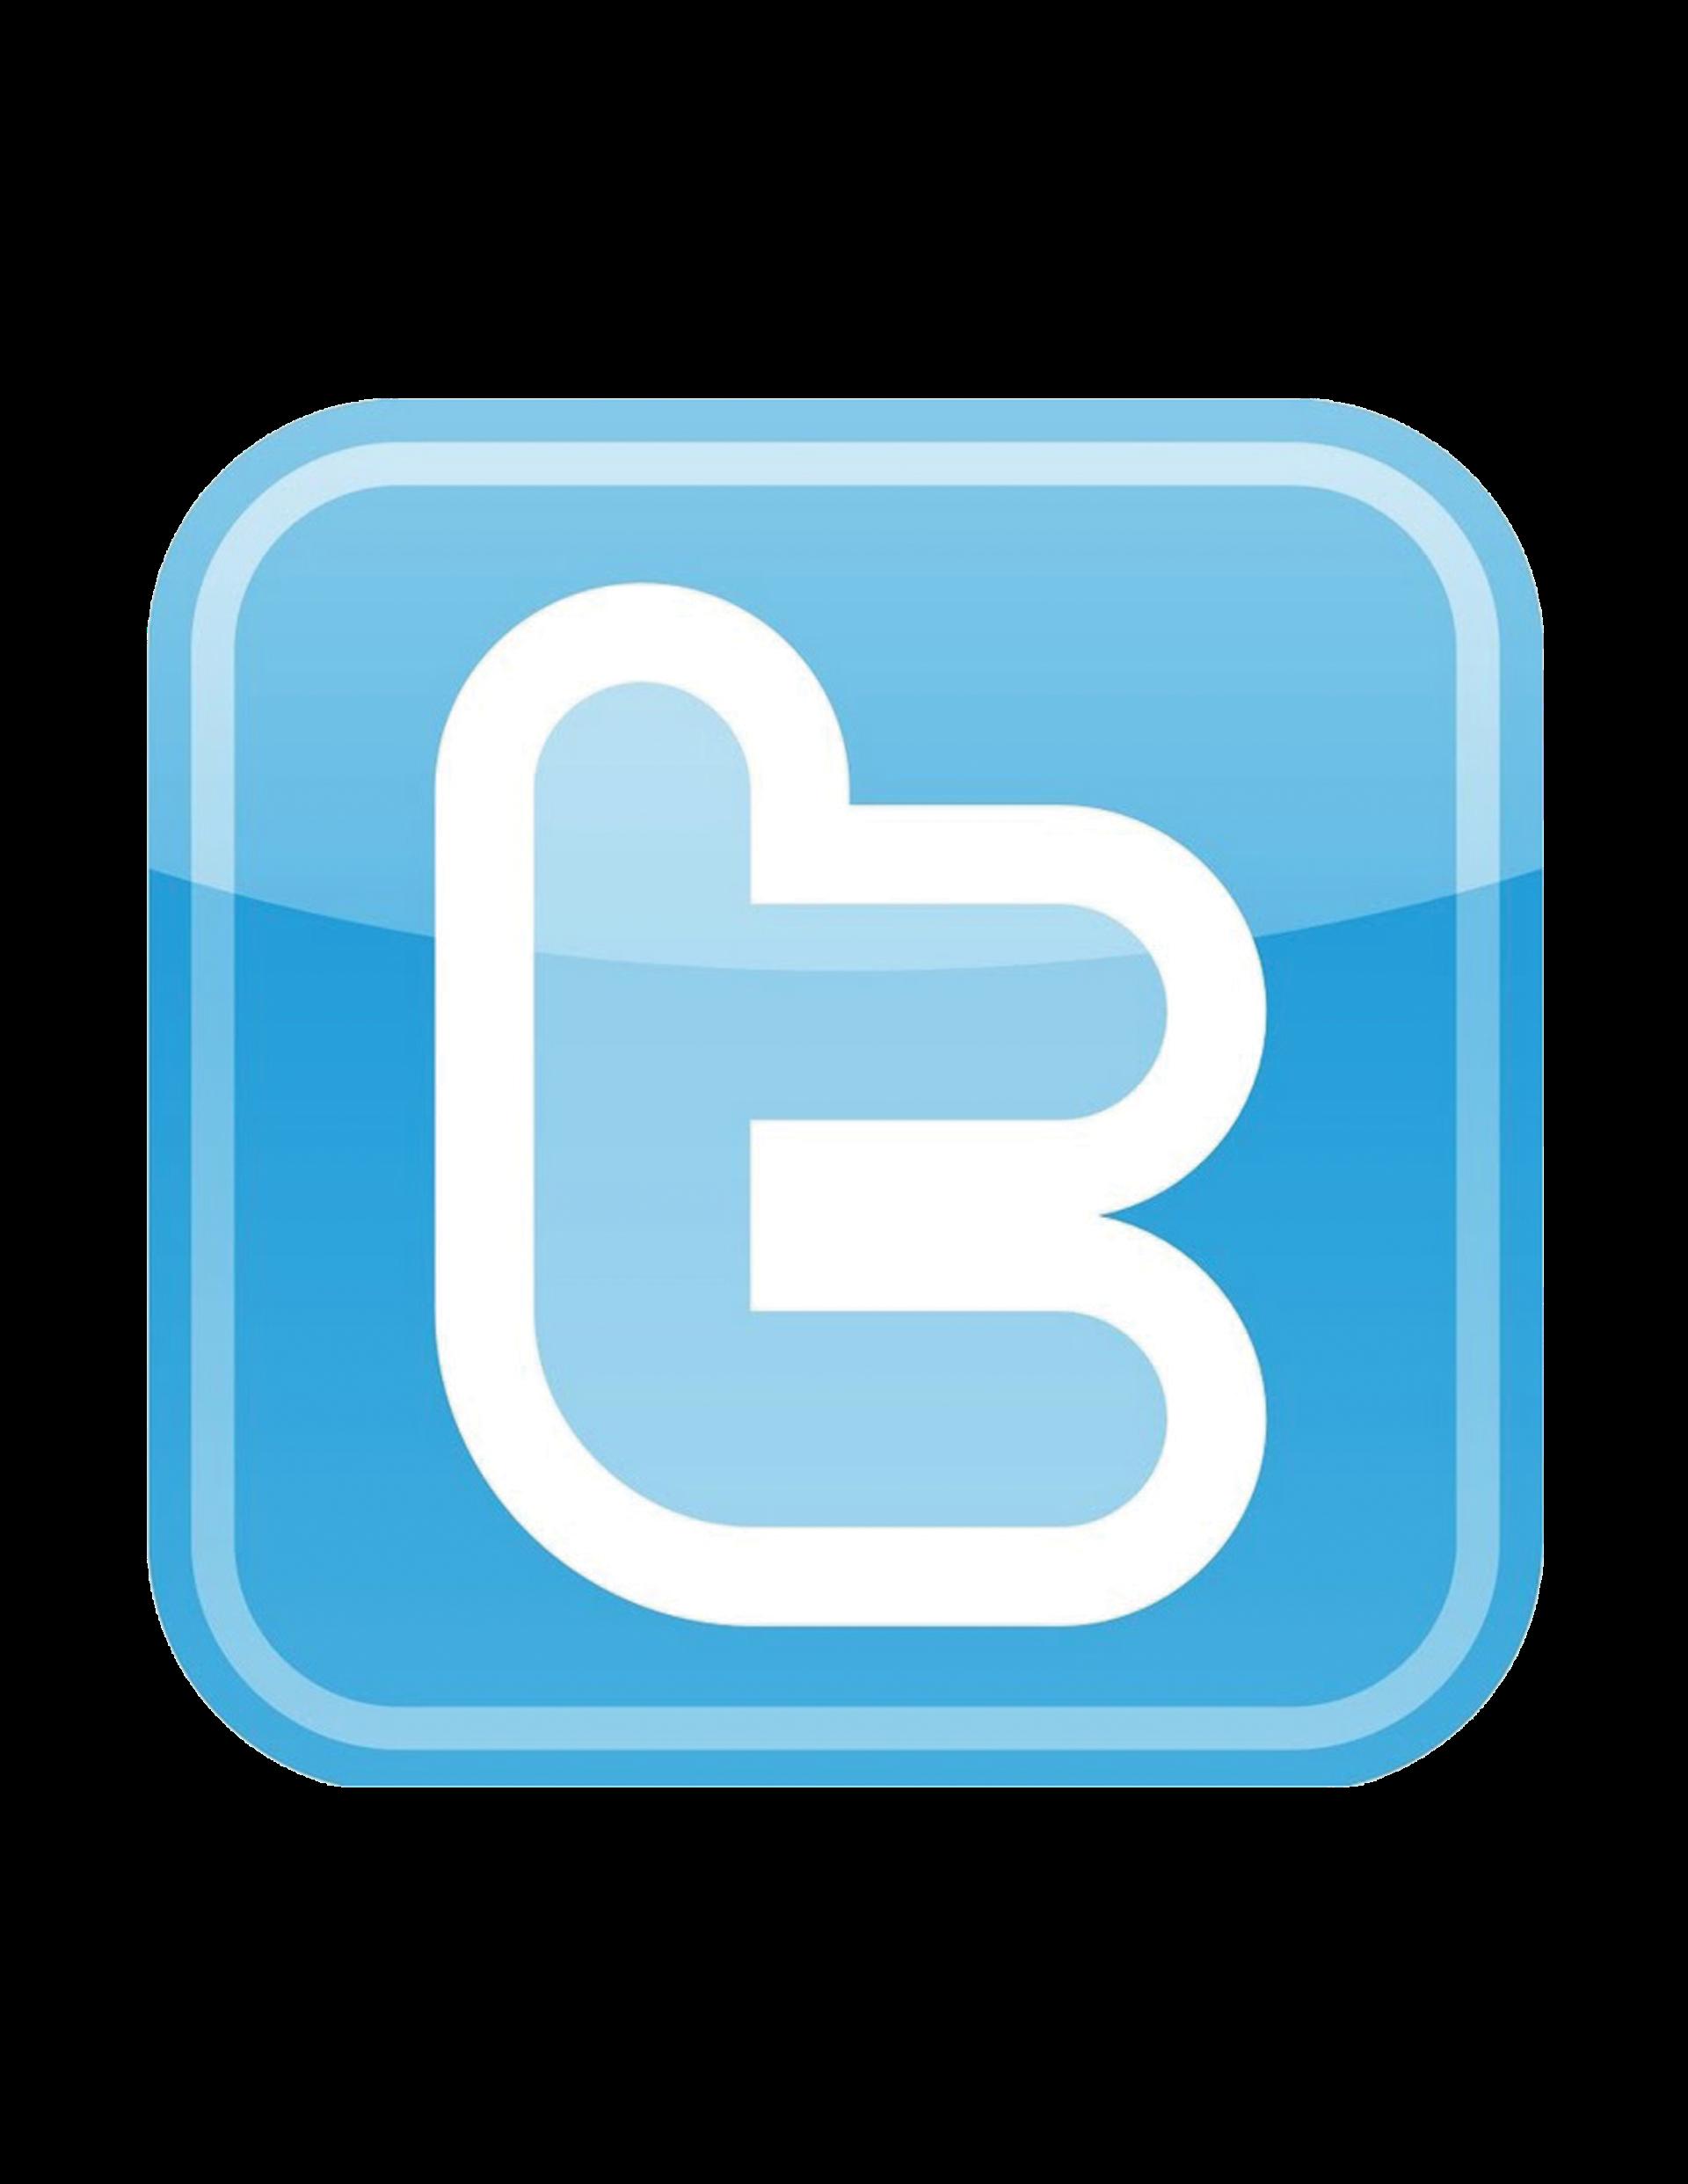 Social media city of. Facebook clipart small size